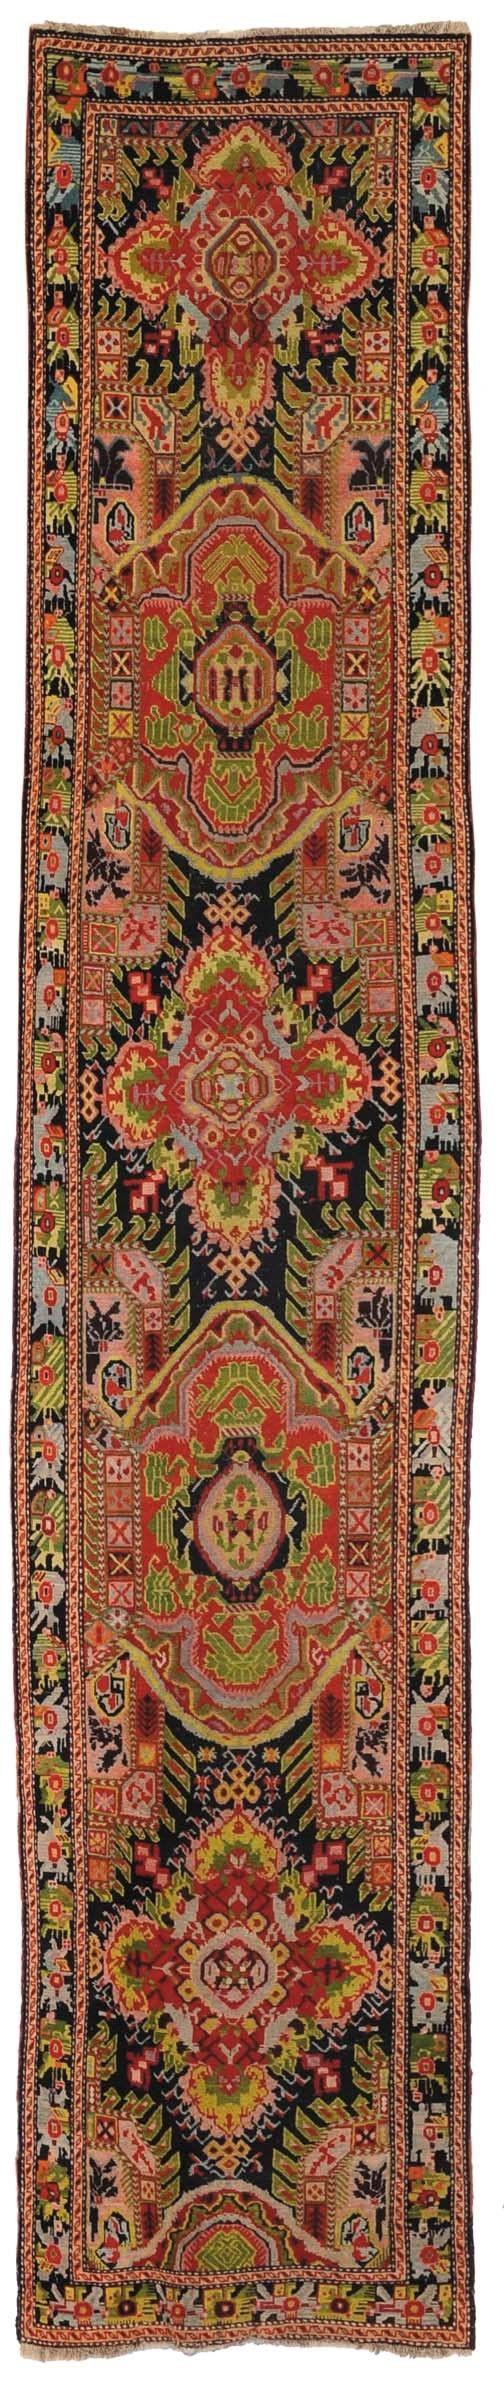 Tappeto passatoia caucasica Karadagh, inizio XX secolo  from Cambi Casa d'Este